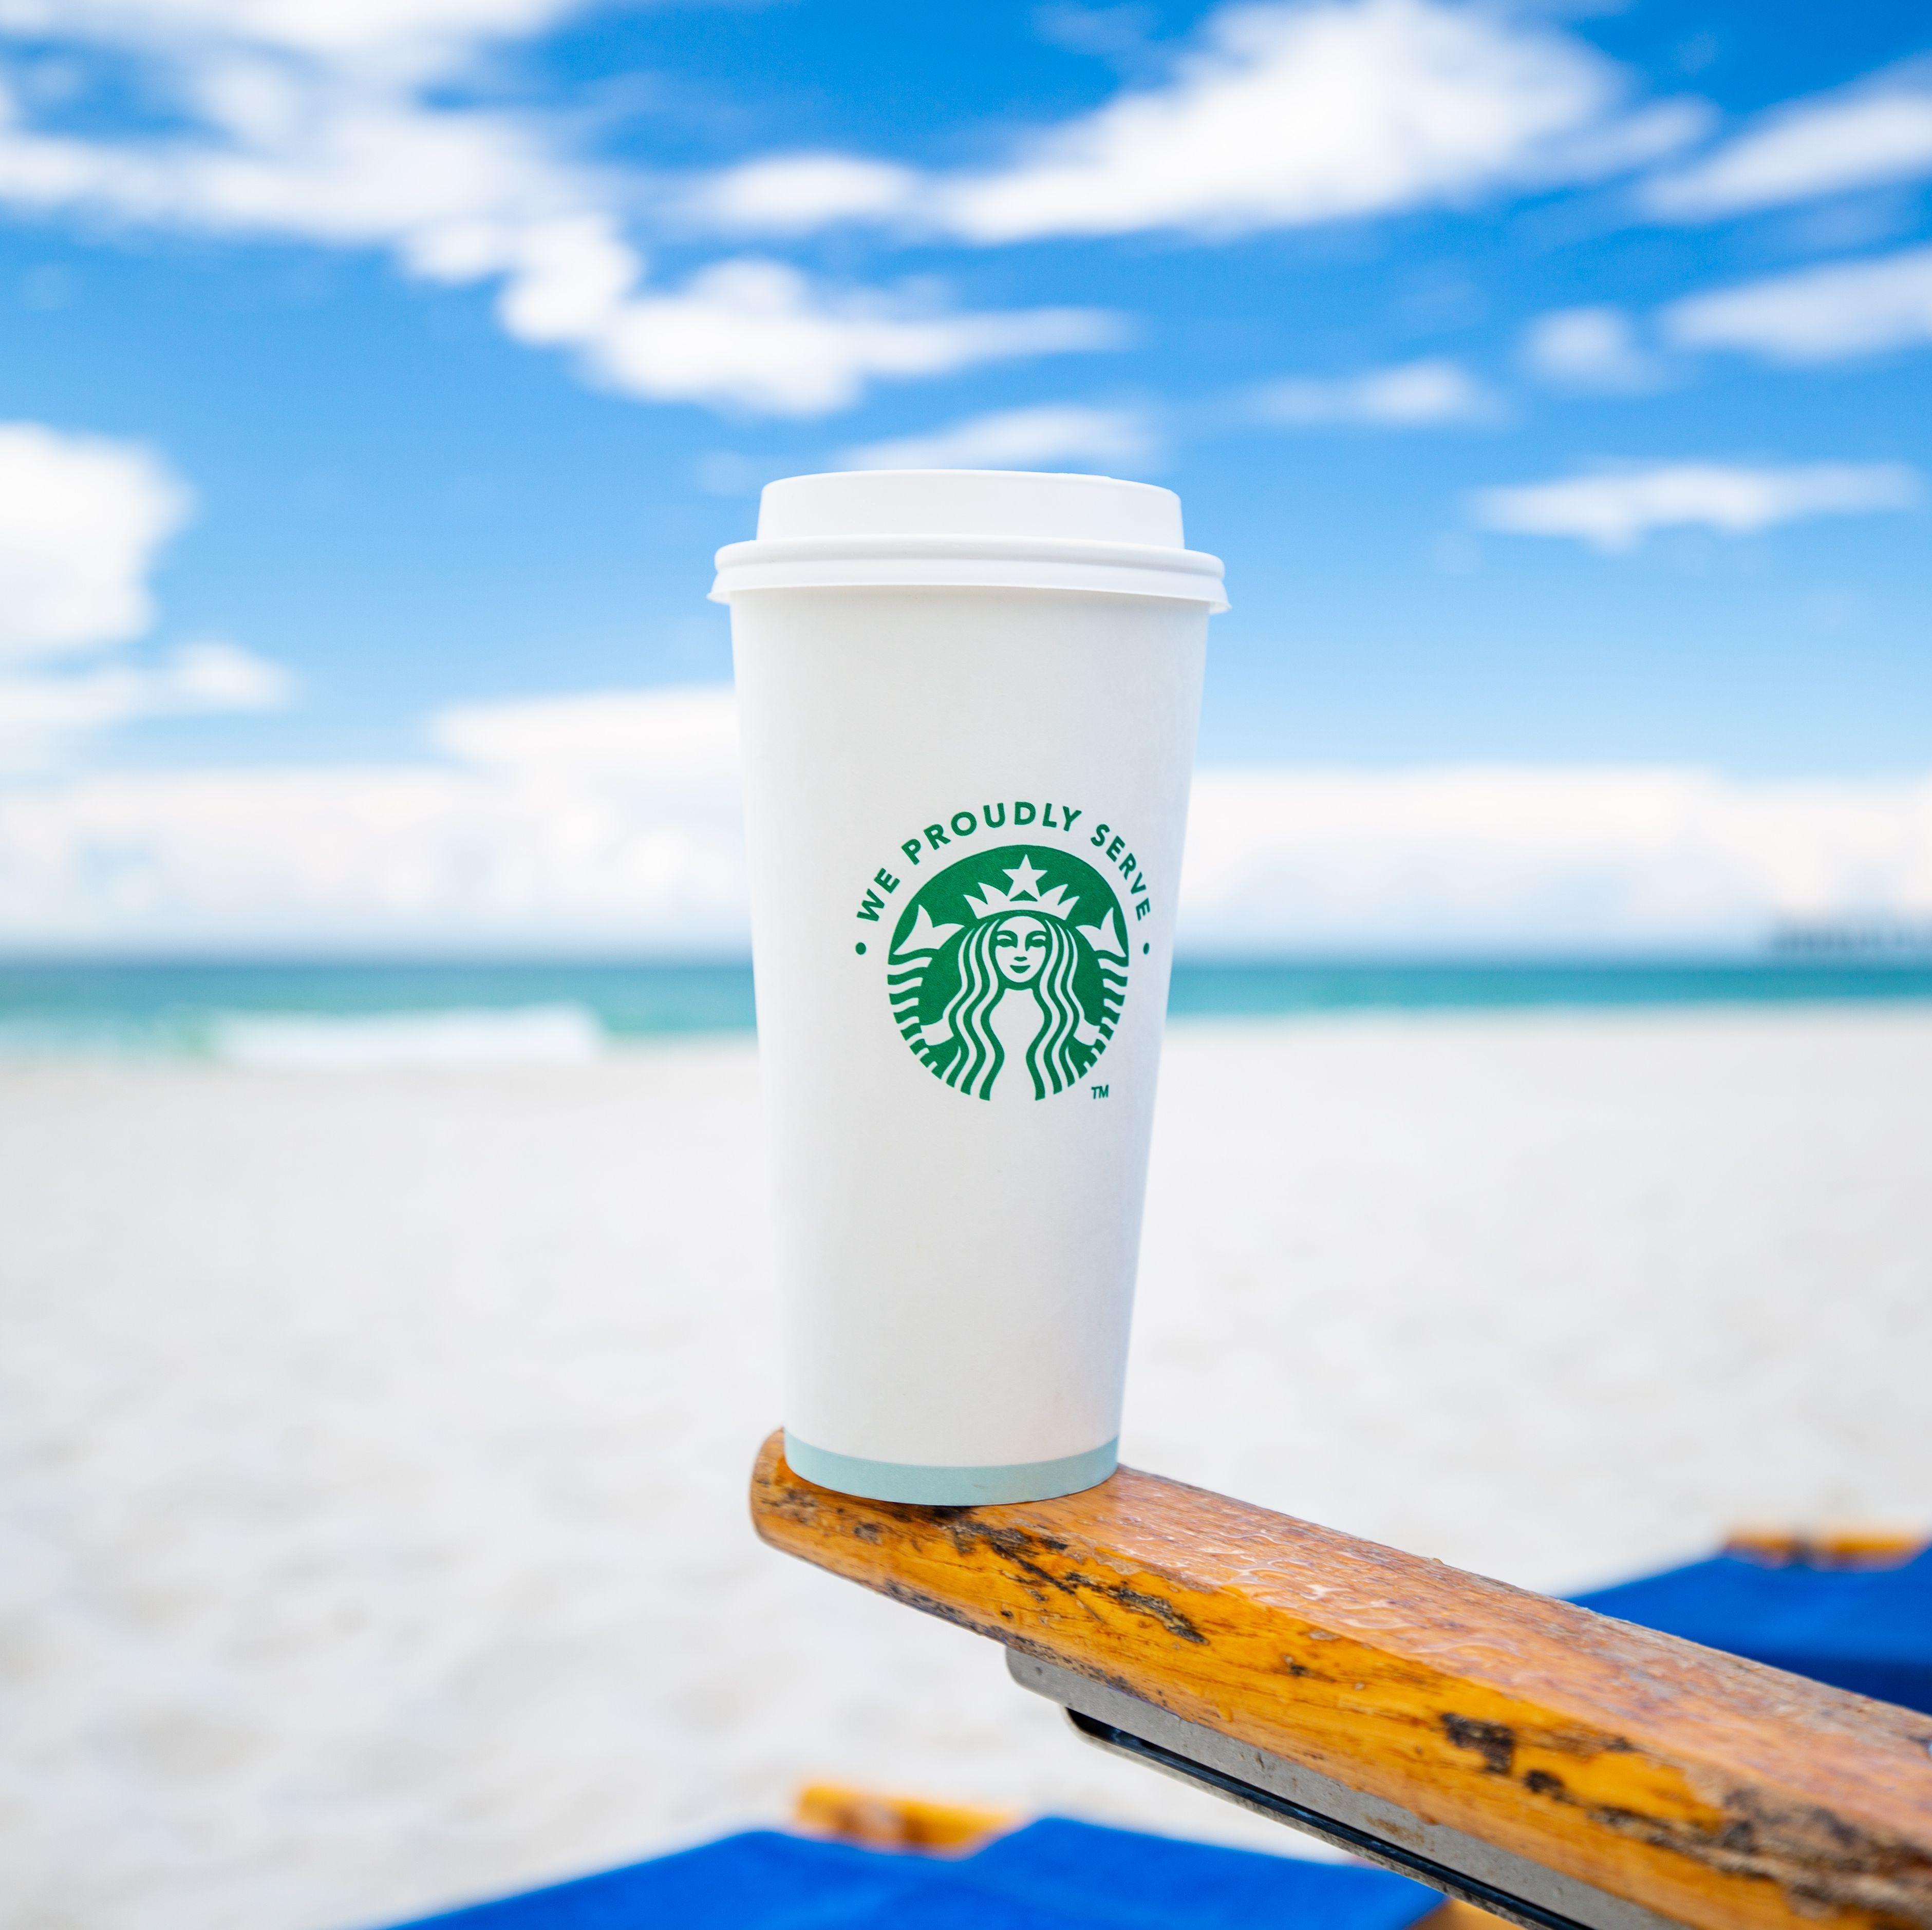 Proudly Serving Starbucks